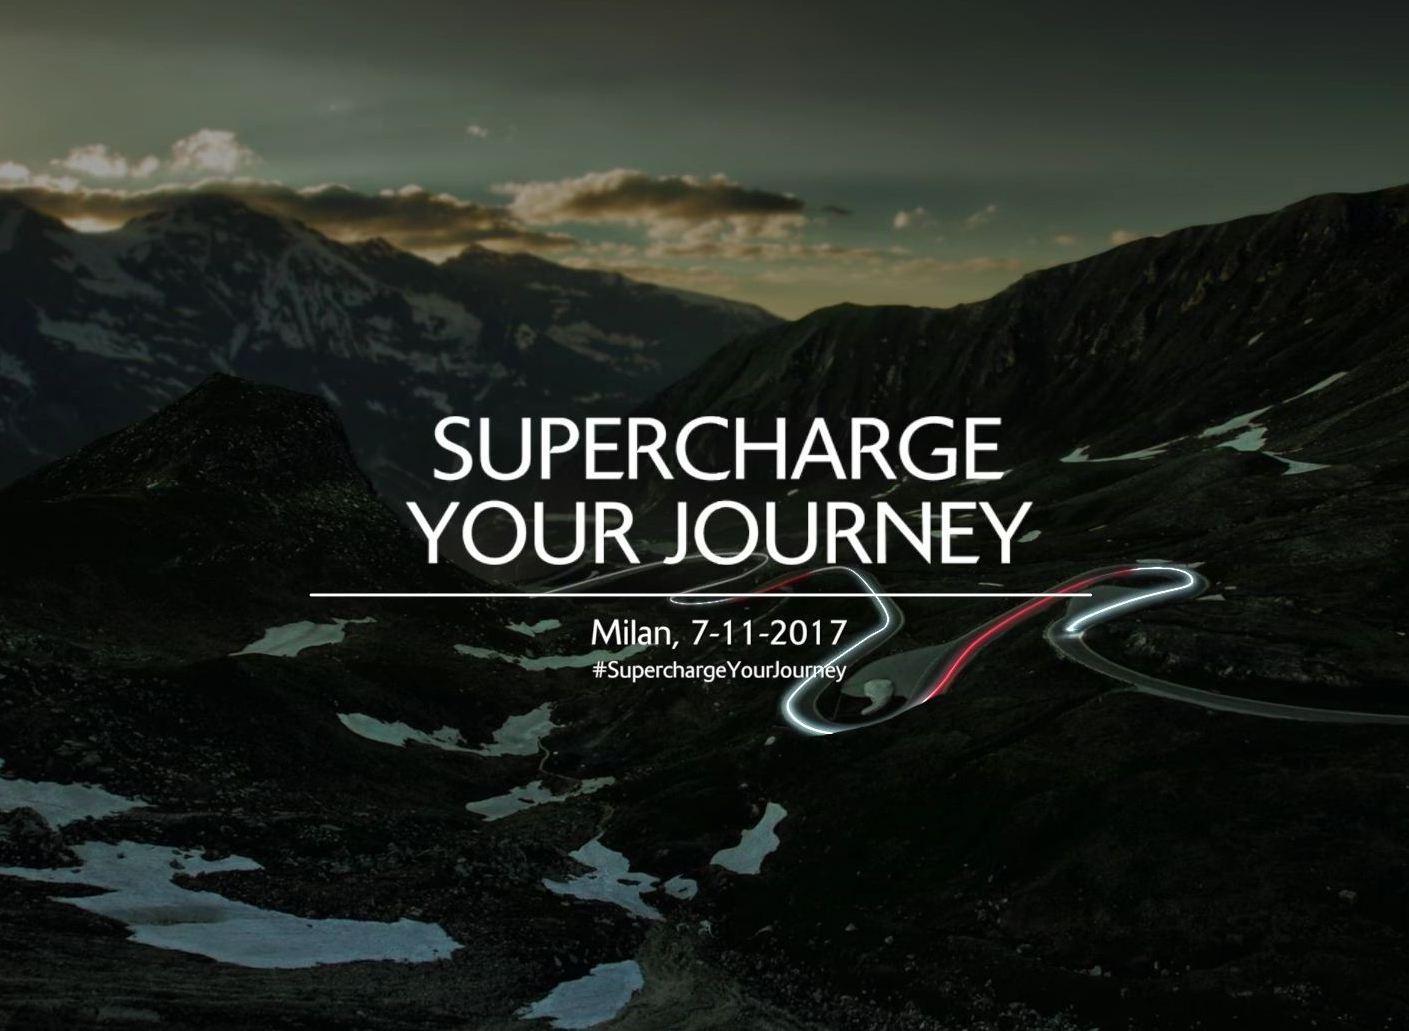 Kawasaki rilis teaser Supercharge Your Journey, inikah motor supercharger terbaru dari Kawasaki selain Ninja H2 ?